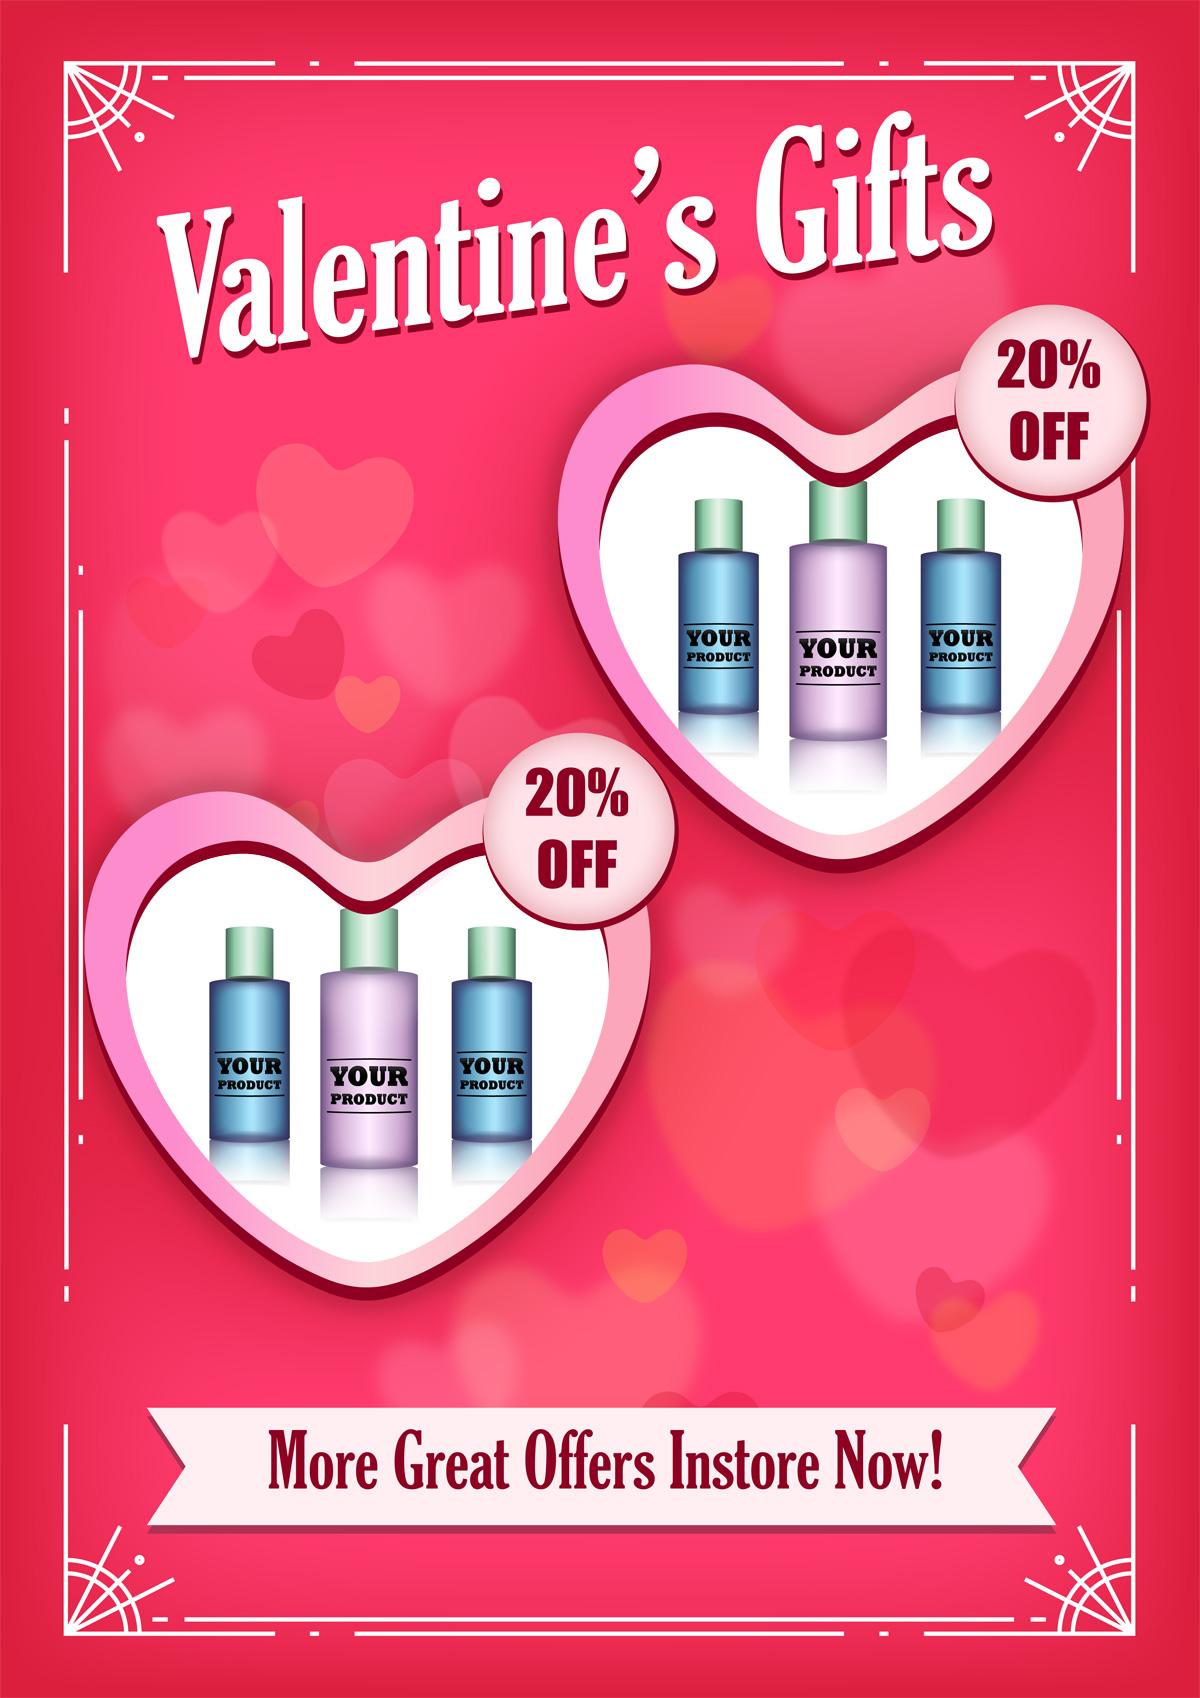 valentines-day-theme-3